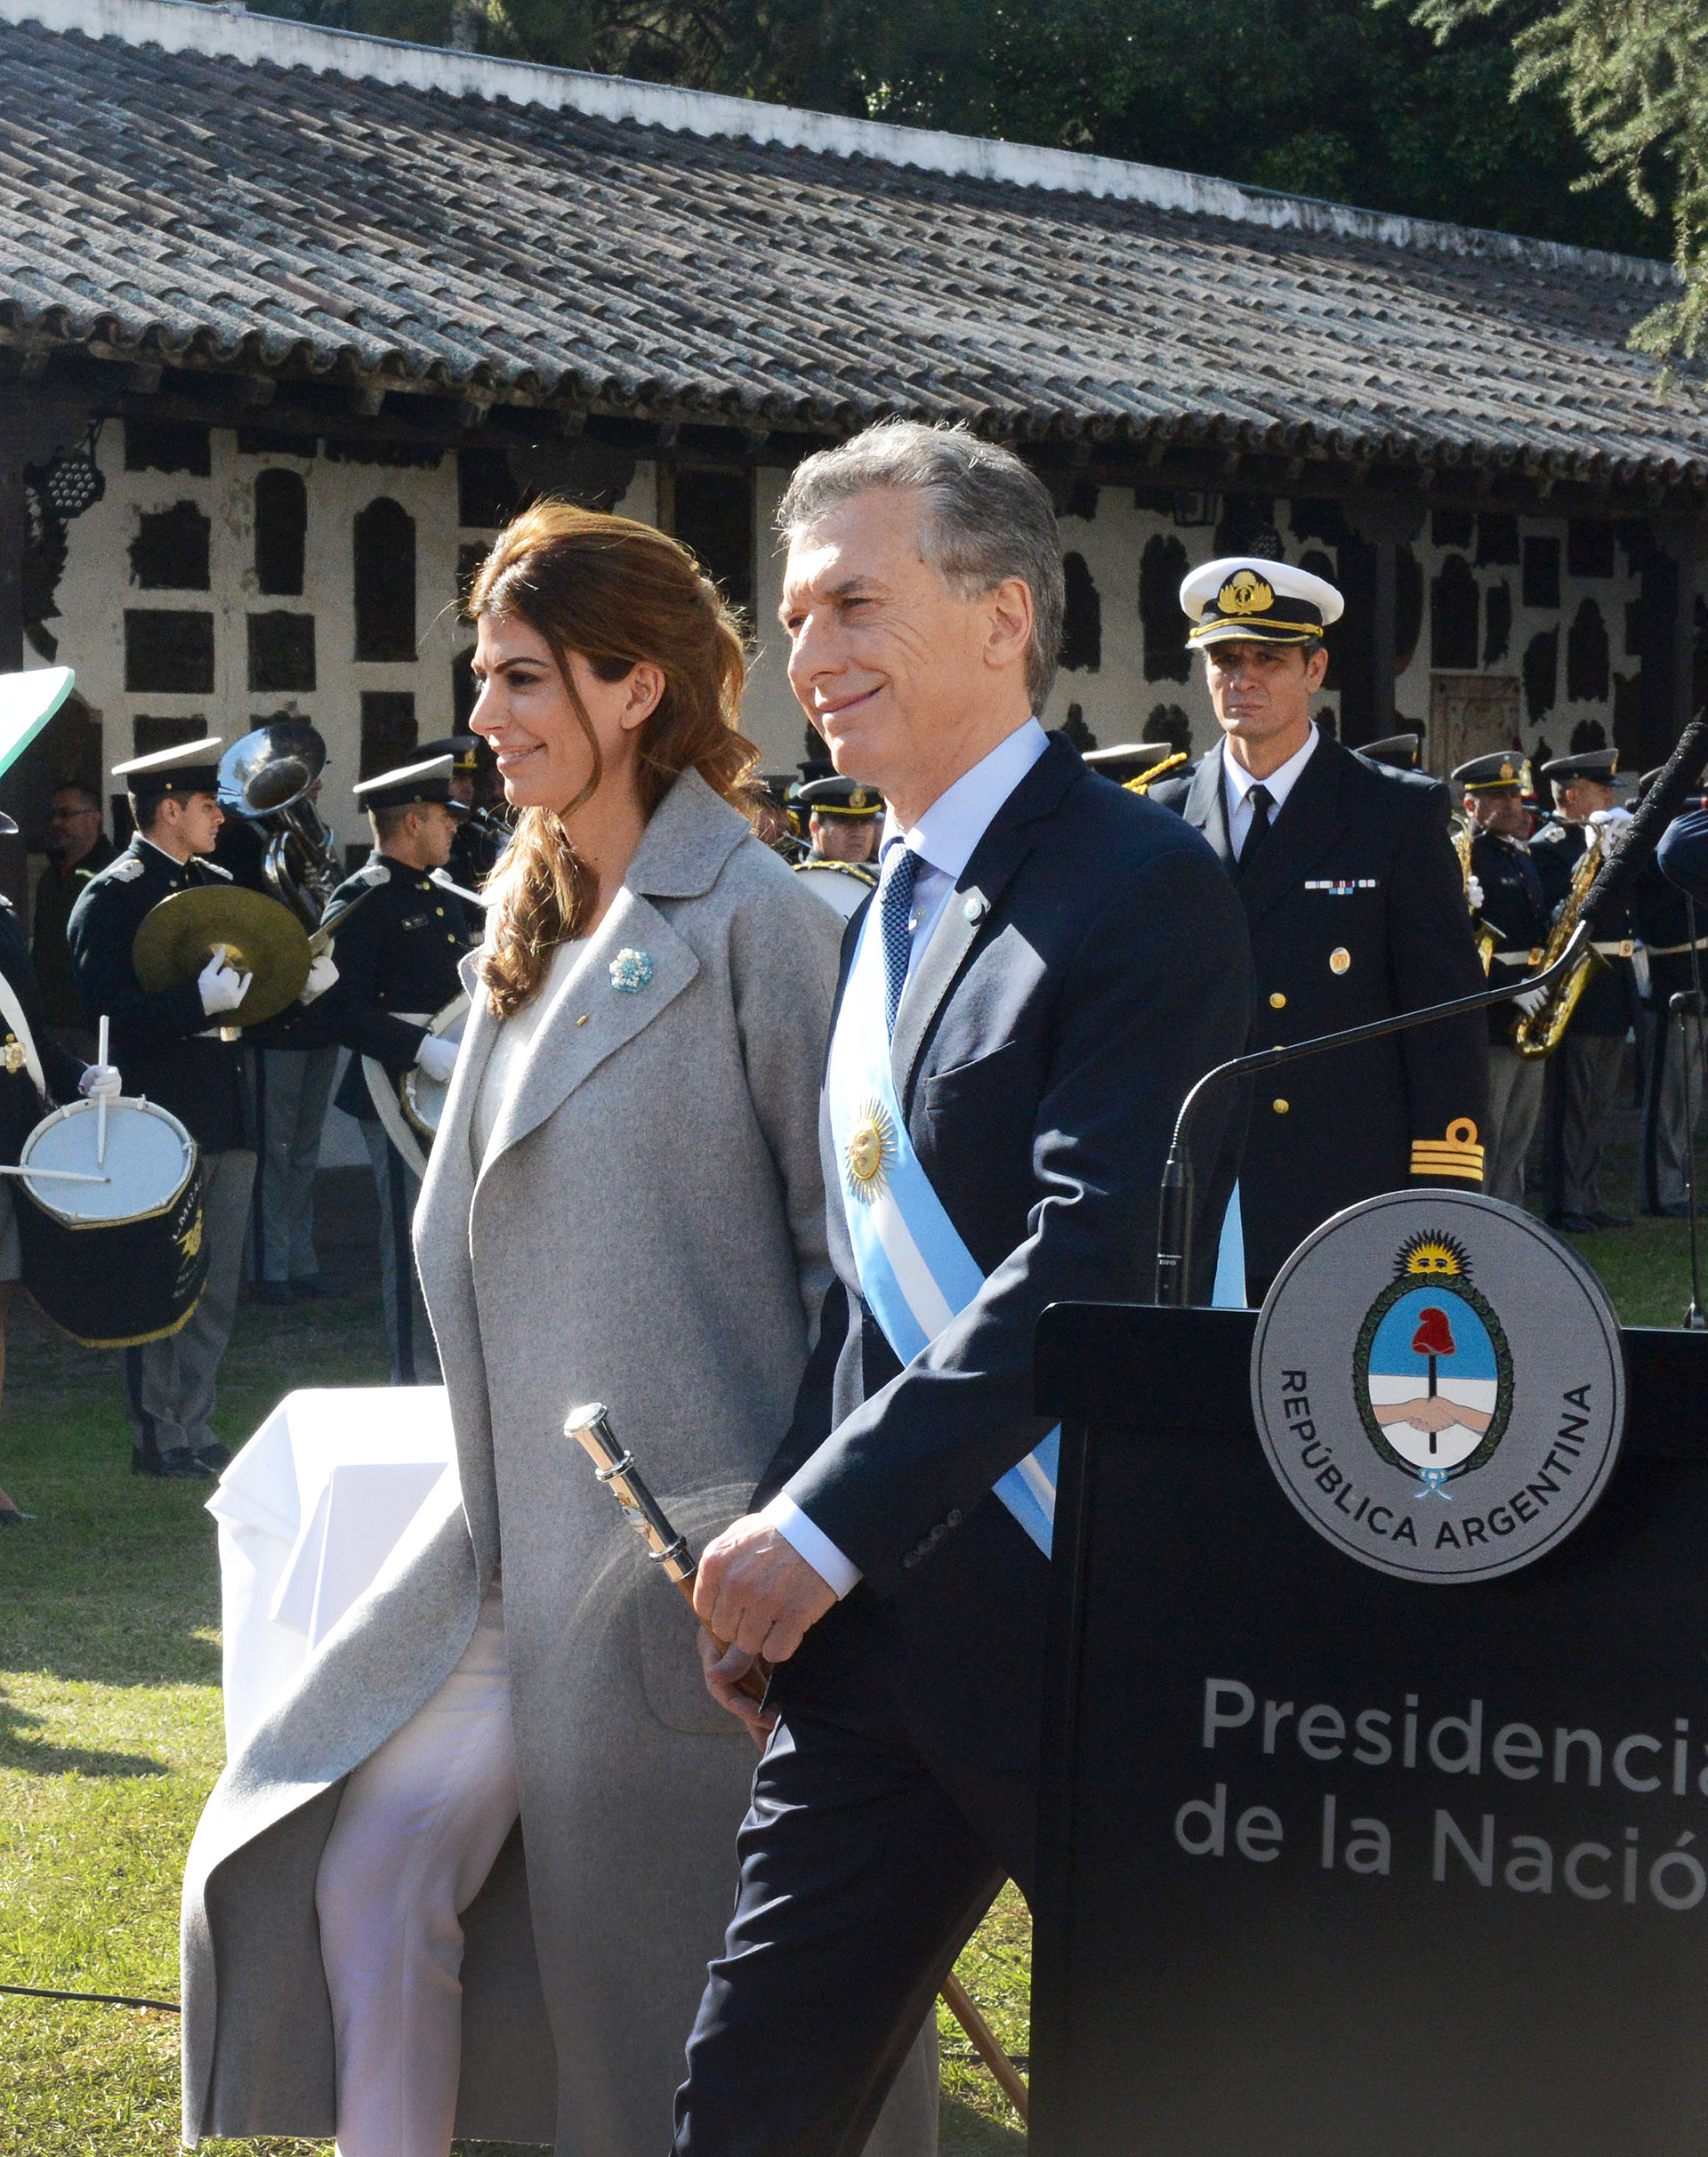 En un extenso discurso de fuerte contenido político, Macri admitió problemas de gestión como consecuencia de las turbulencias económicas que afectan al país.